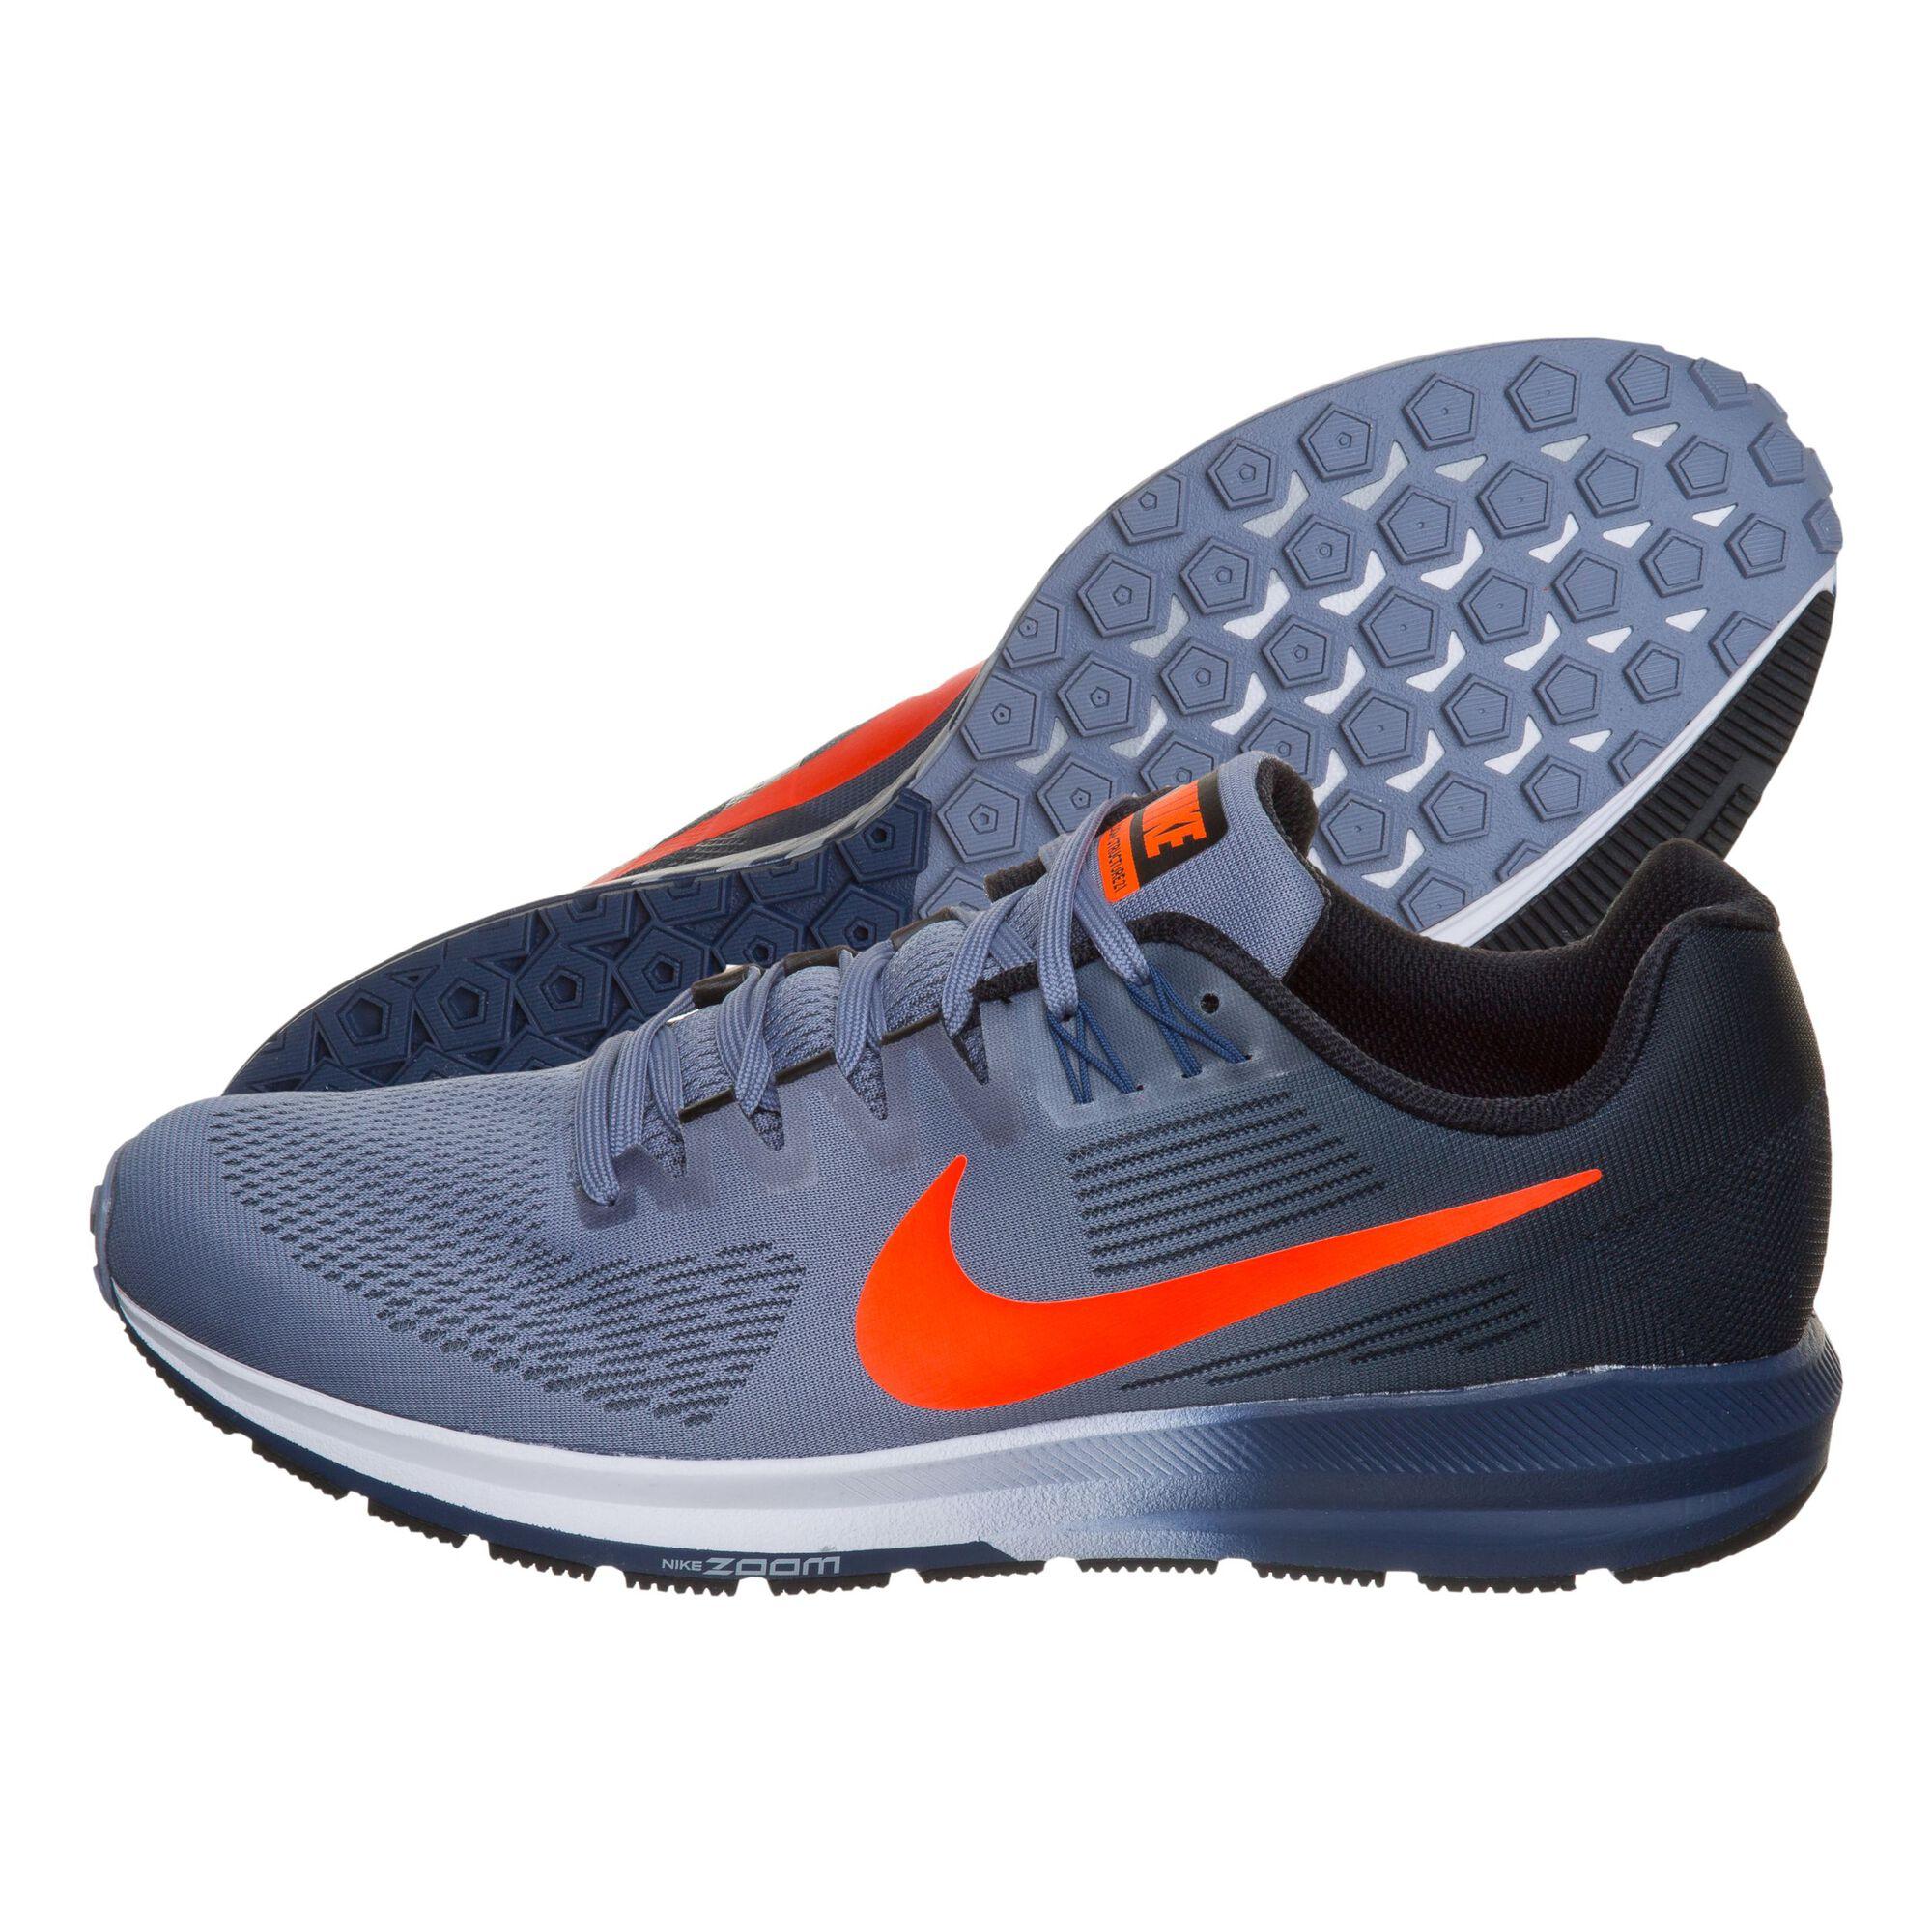 baabdeaeeaaa buy Nike Air Zoom Structure 21 Stability Running Shoe Men - Grey ...